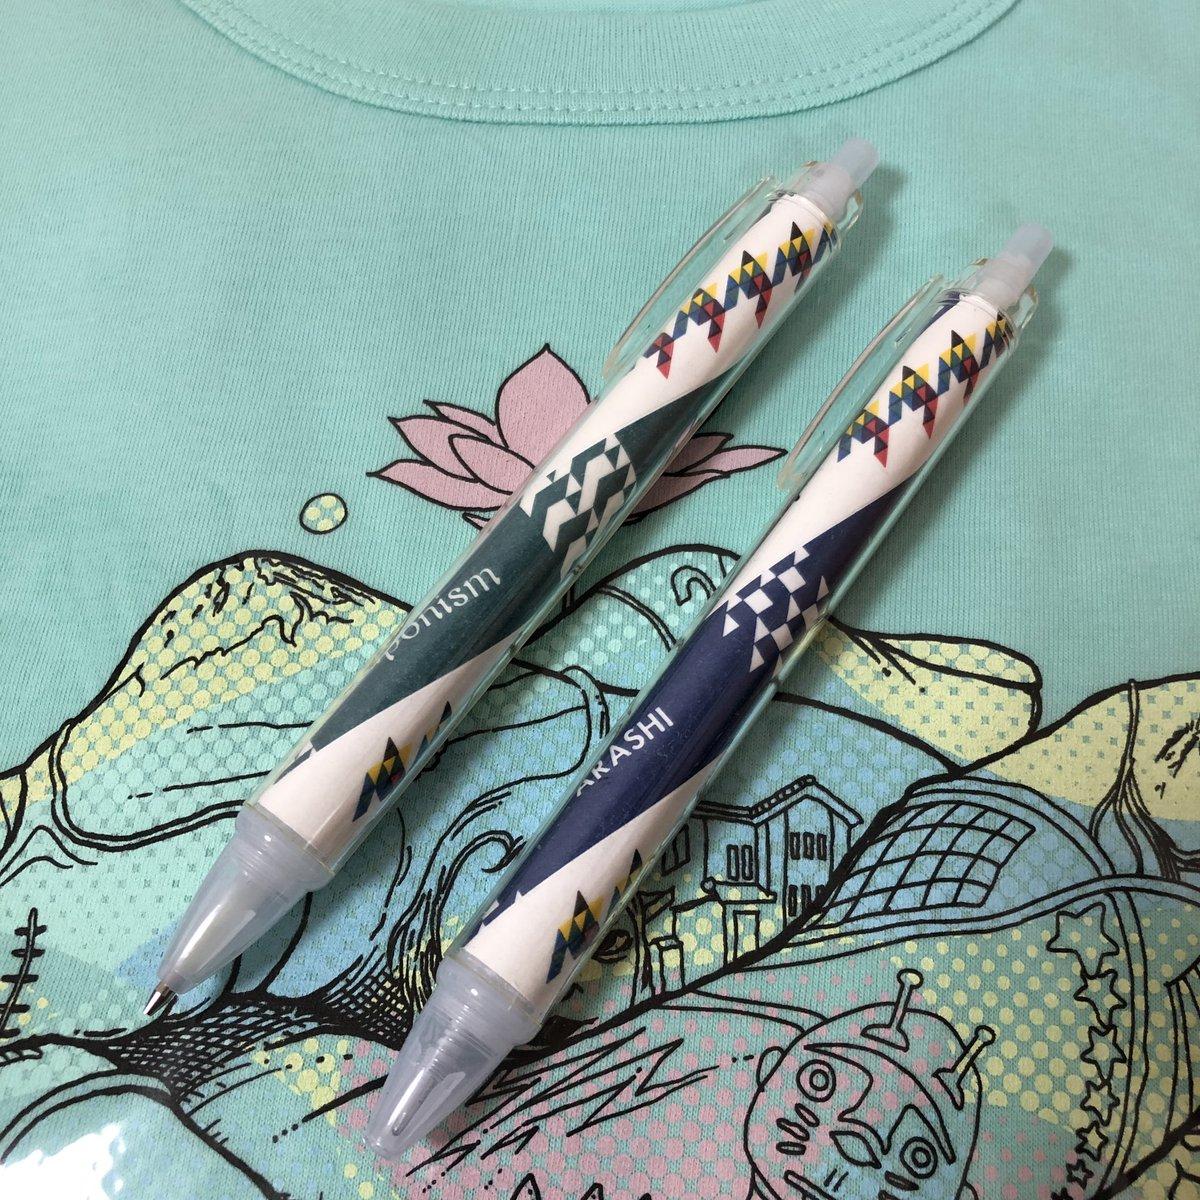 "test ツイッターメディア - オリジナルシャープペン&ボールペンを作ってみました🎶 銀テープで作ってみたかったけど、幅が足りず断念😓 「ARASHI ""Japonism"" 」のマスキングテープで作成💙❤💚💛💜 #オリジナルシャープペン #オリジナルボールペン #セリア #ARASHI #Japonism #マスキングテープ https://t.co/6hQKDNo3NE"